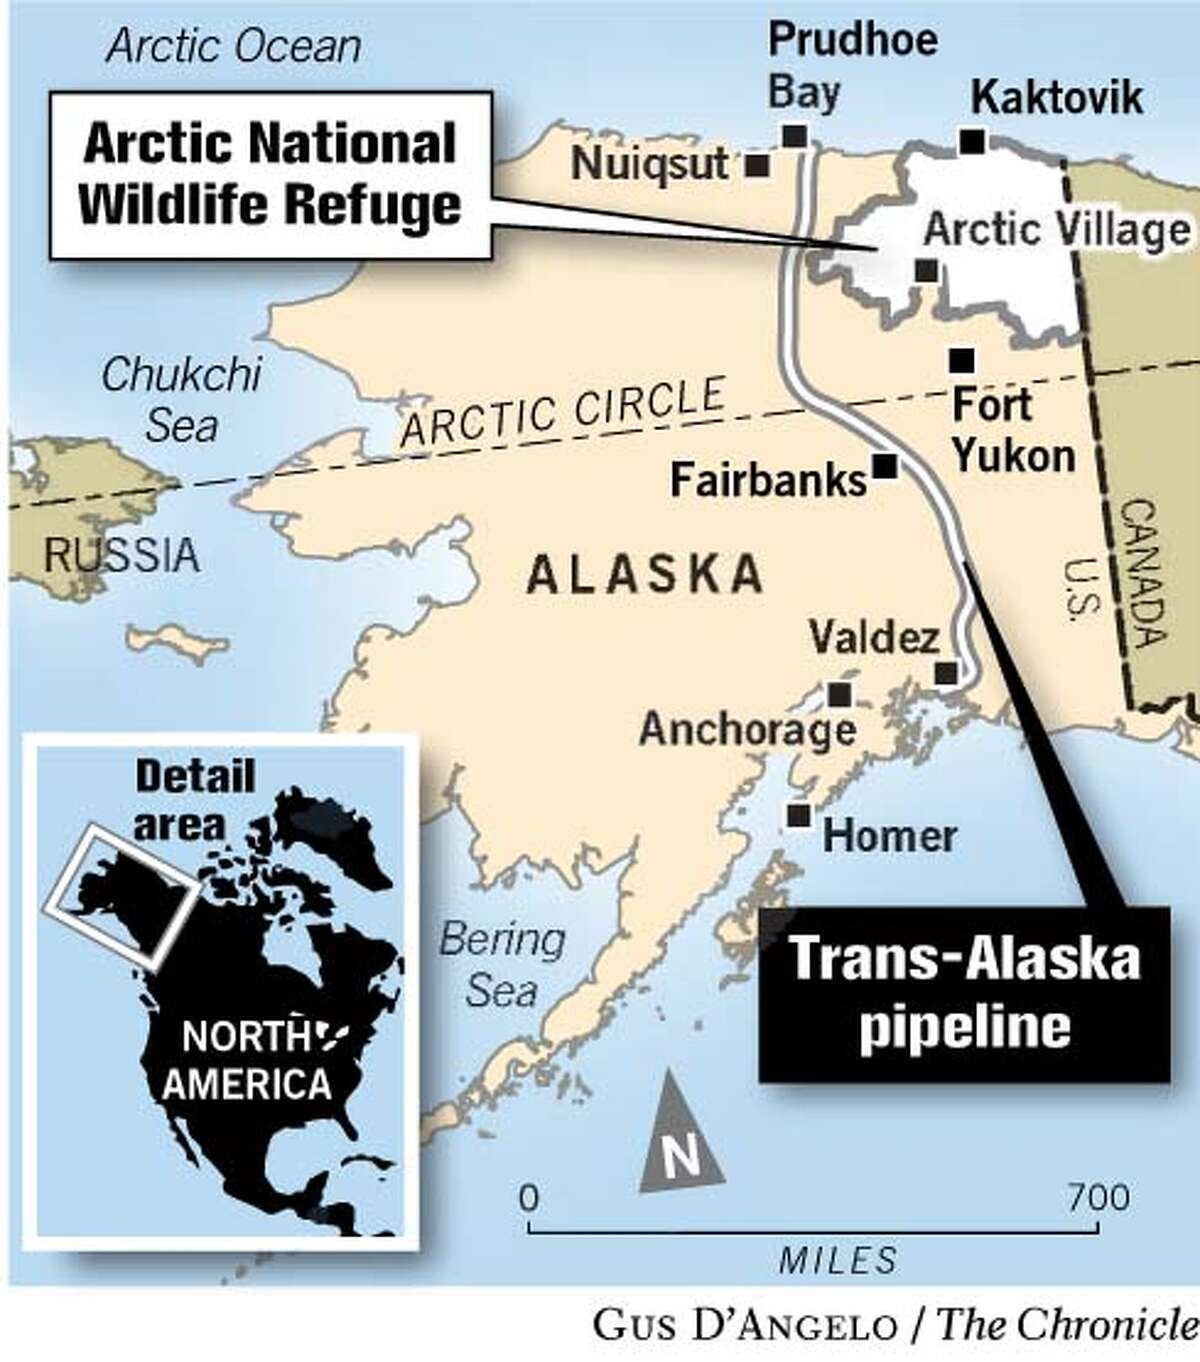 (A1) Arctic National Wildlife